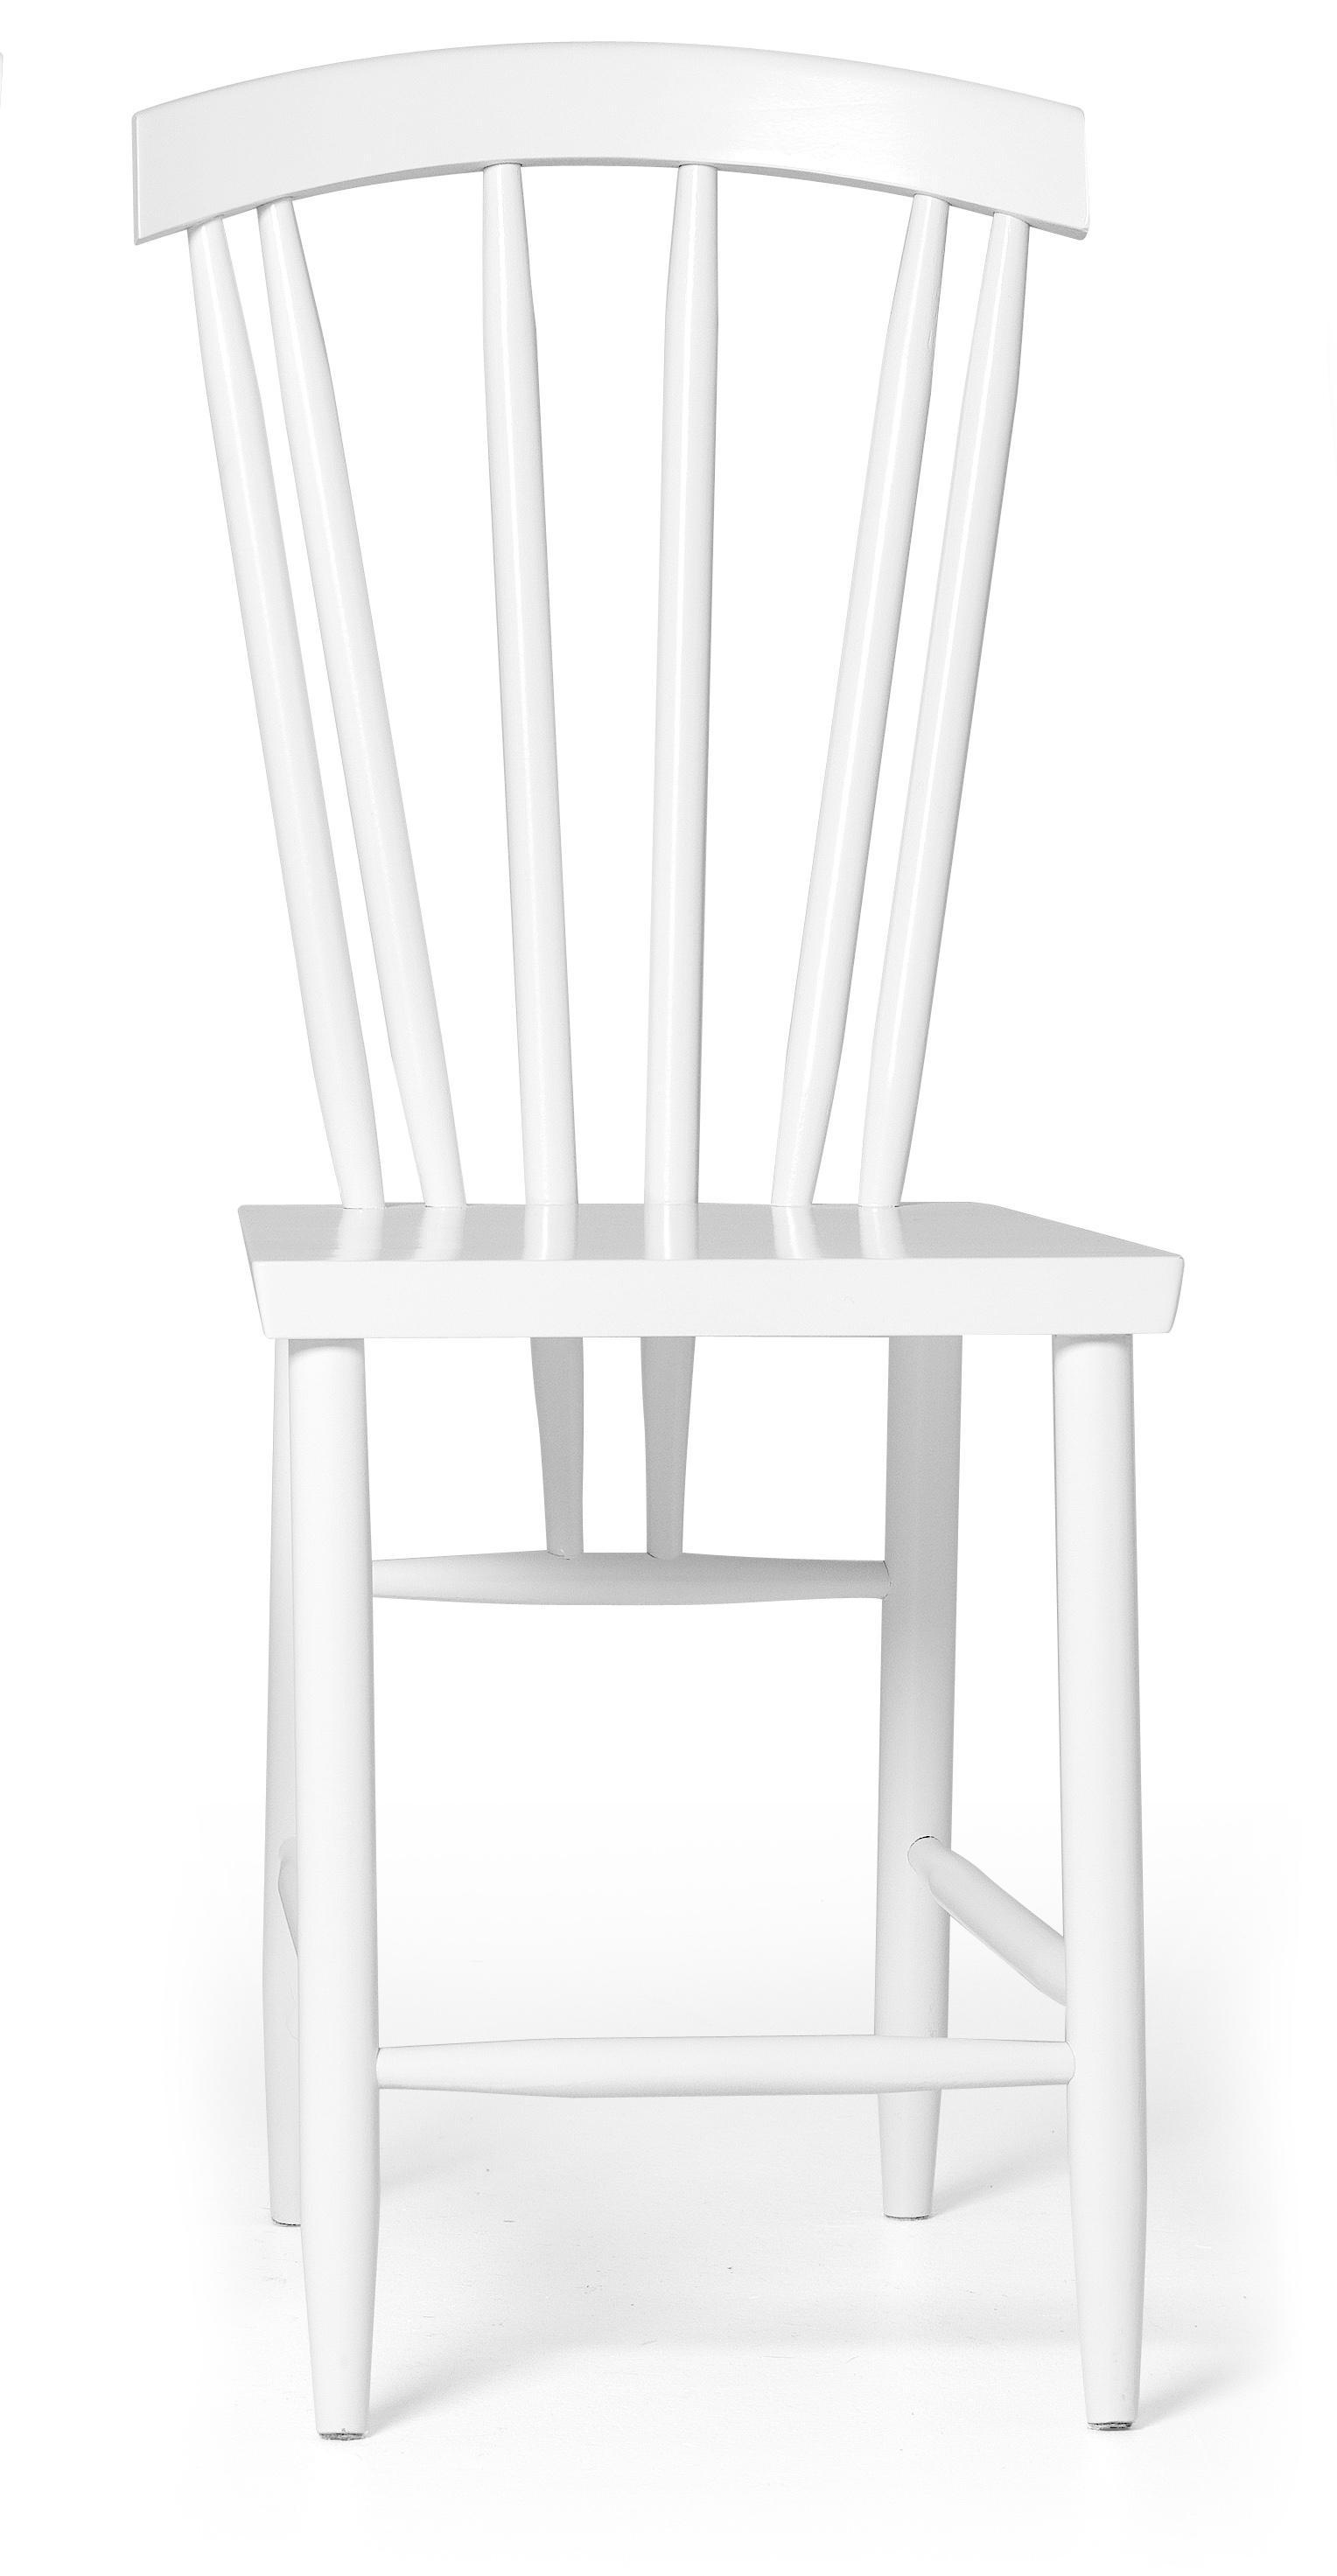 Design house stockholm sedia family n 3 bianca for Sedia design bianca